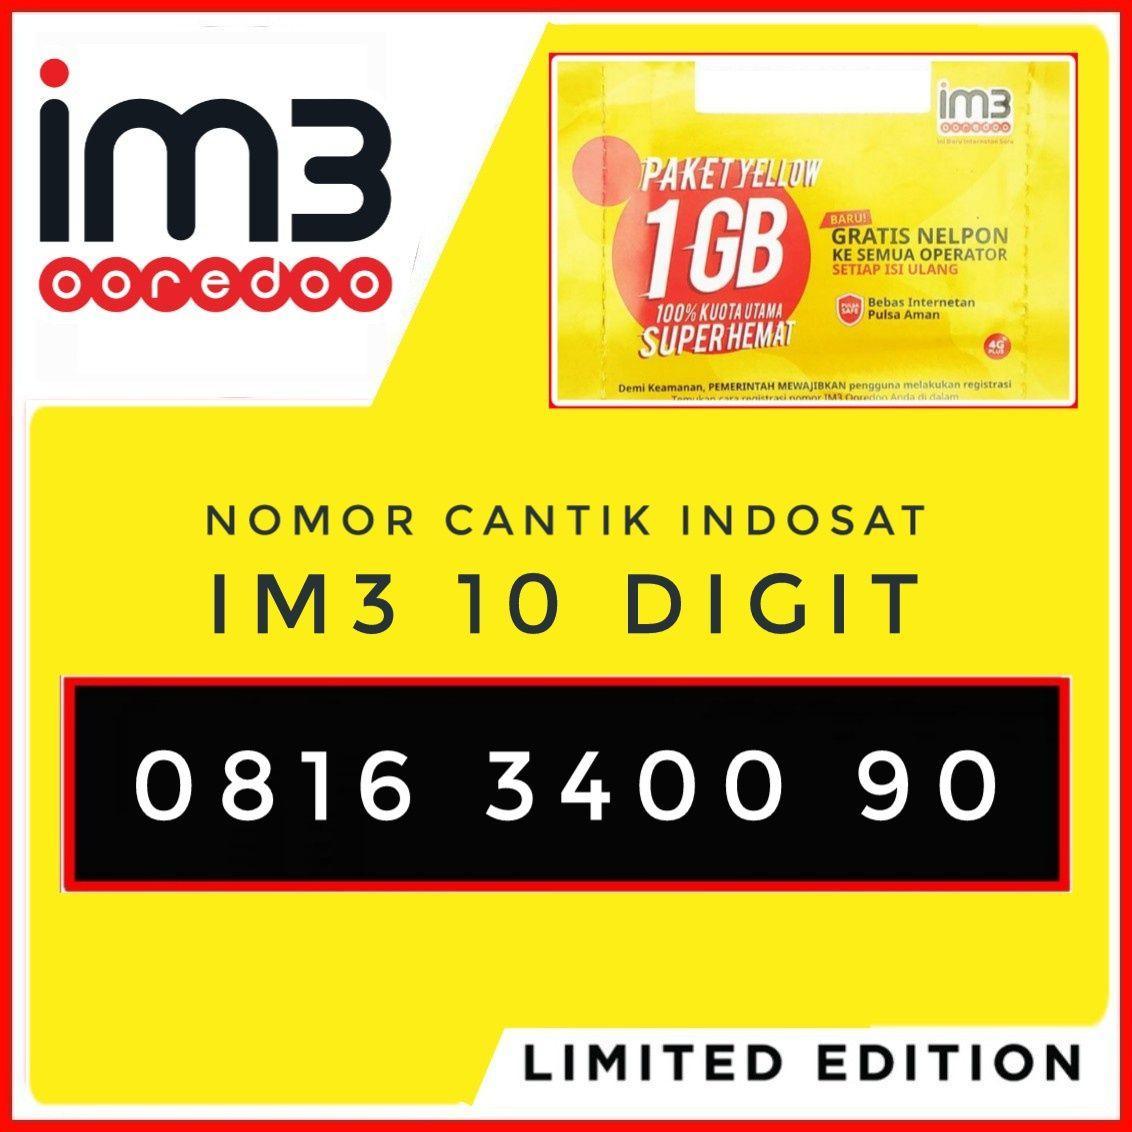 Nomor Cantik IM3 10 Digit Kartu Perdana Nomer Cantik Indosat 10 Digit